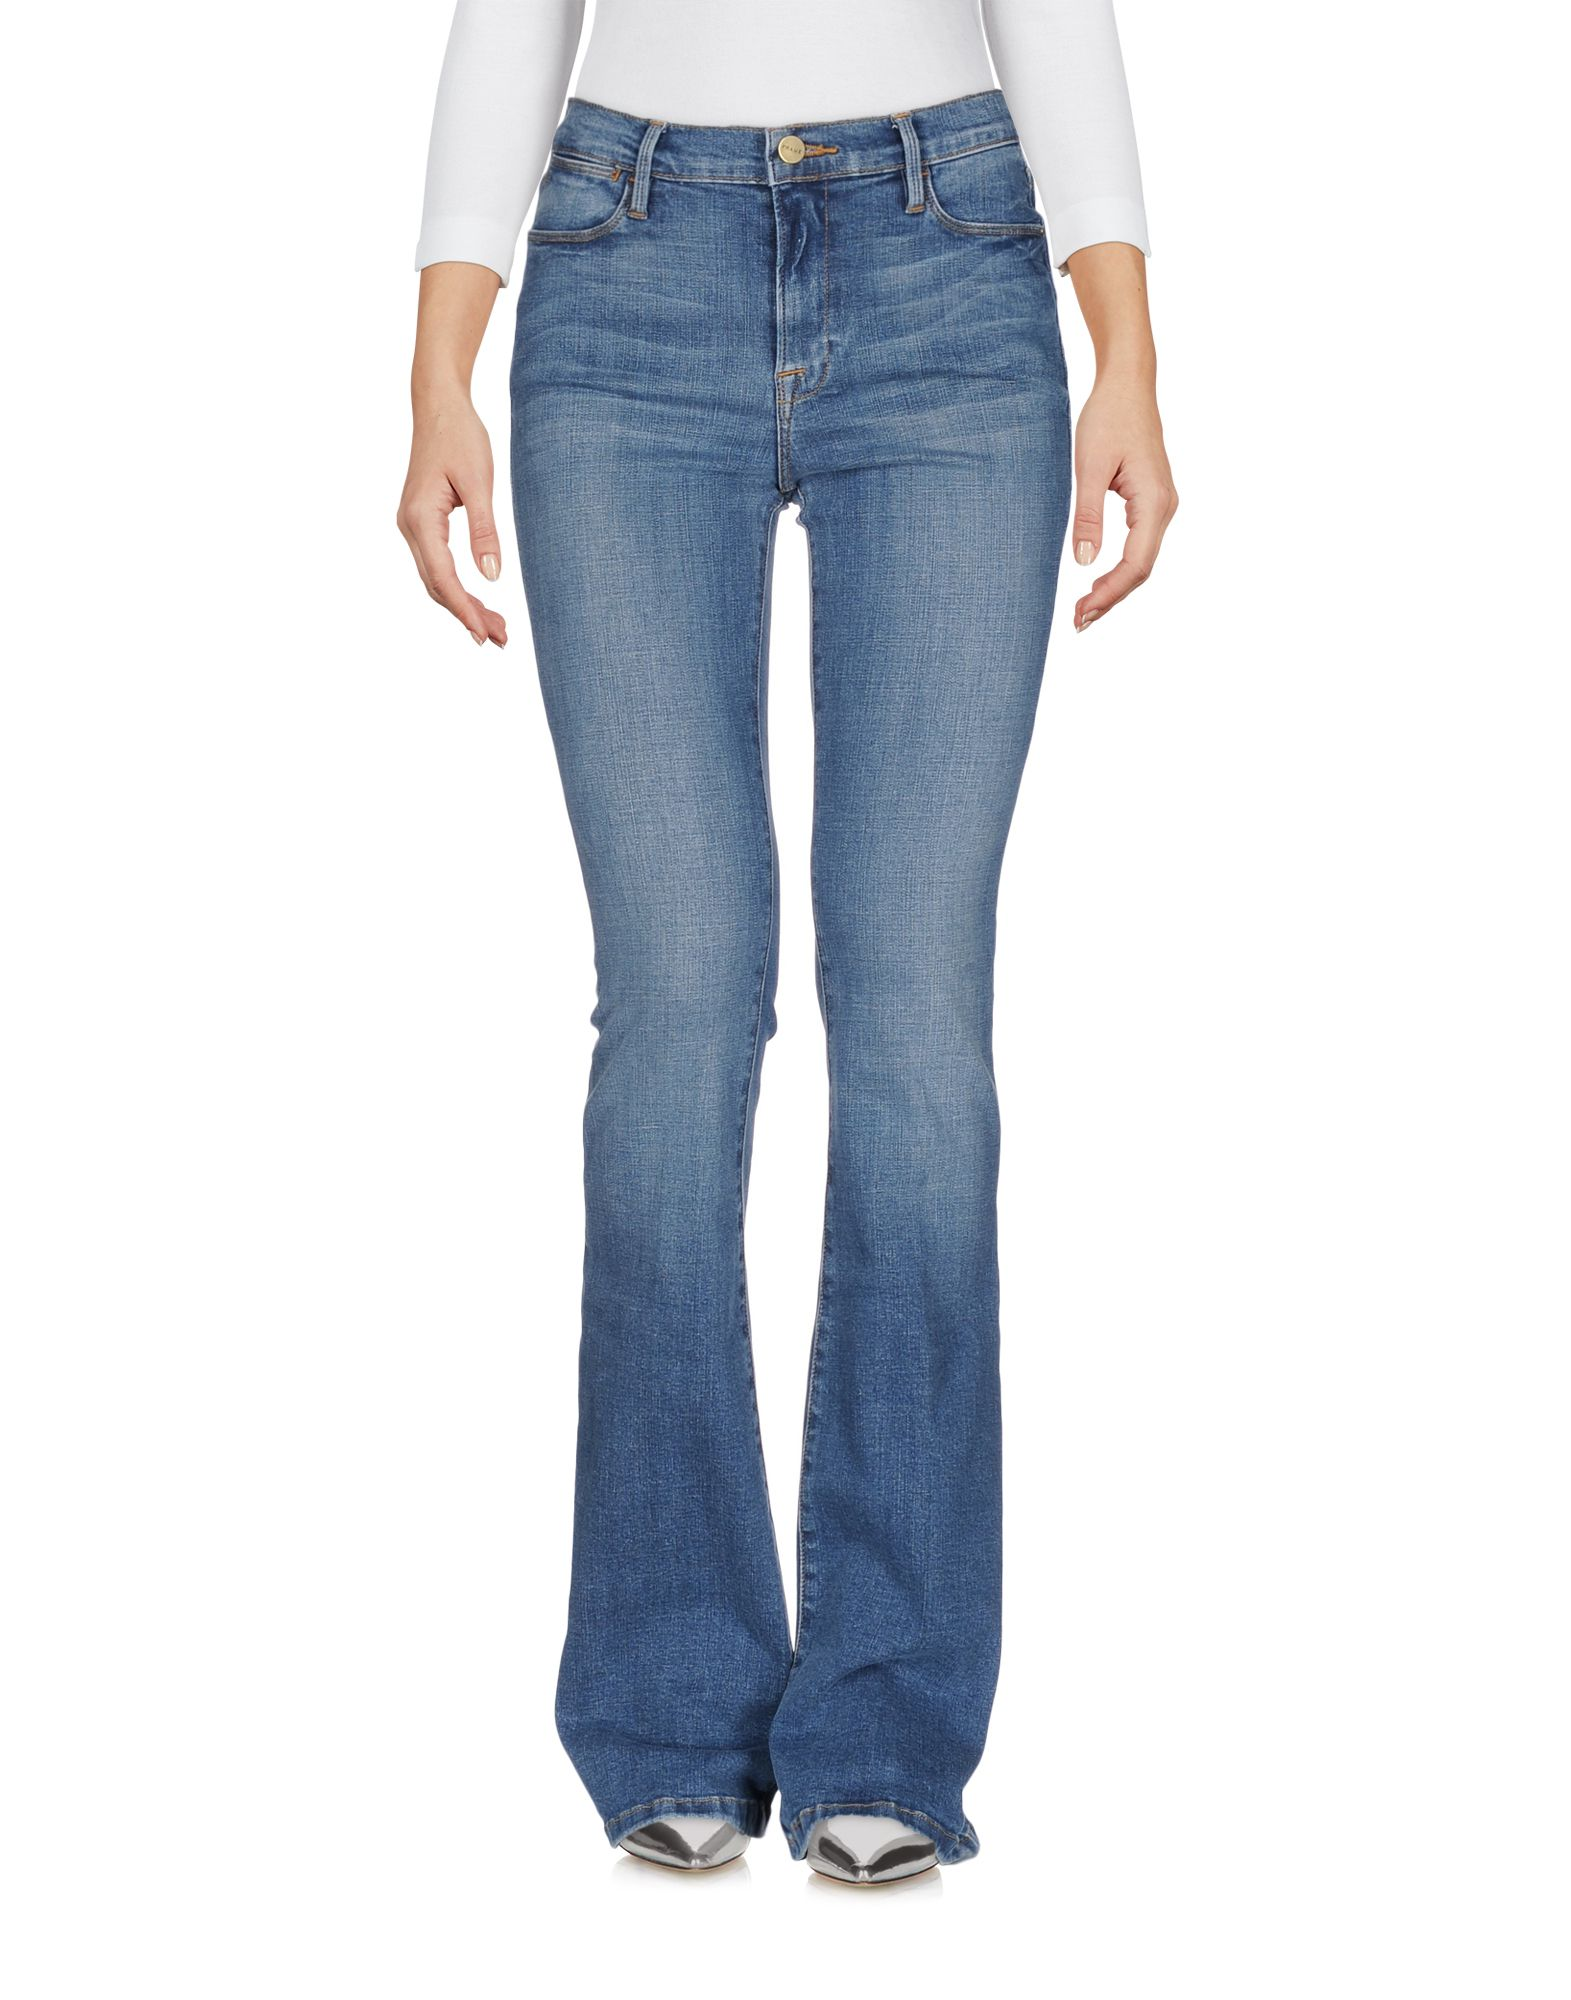 Pantaloni Jeans Frame Donna - Acquista online su sbv3g